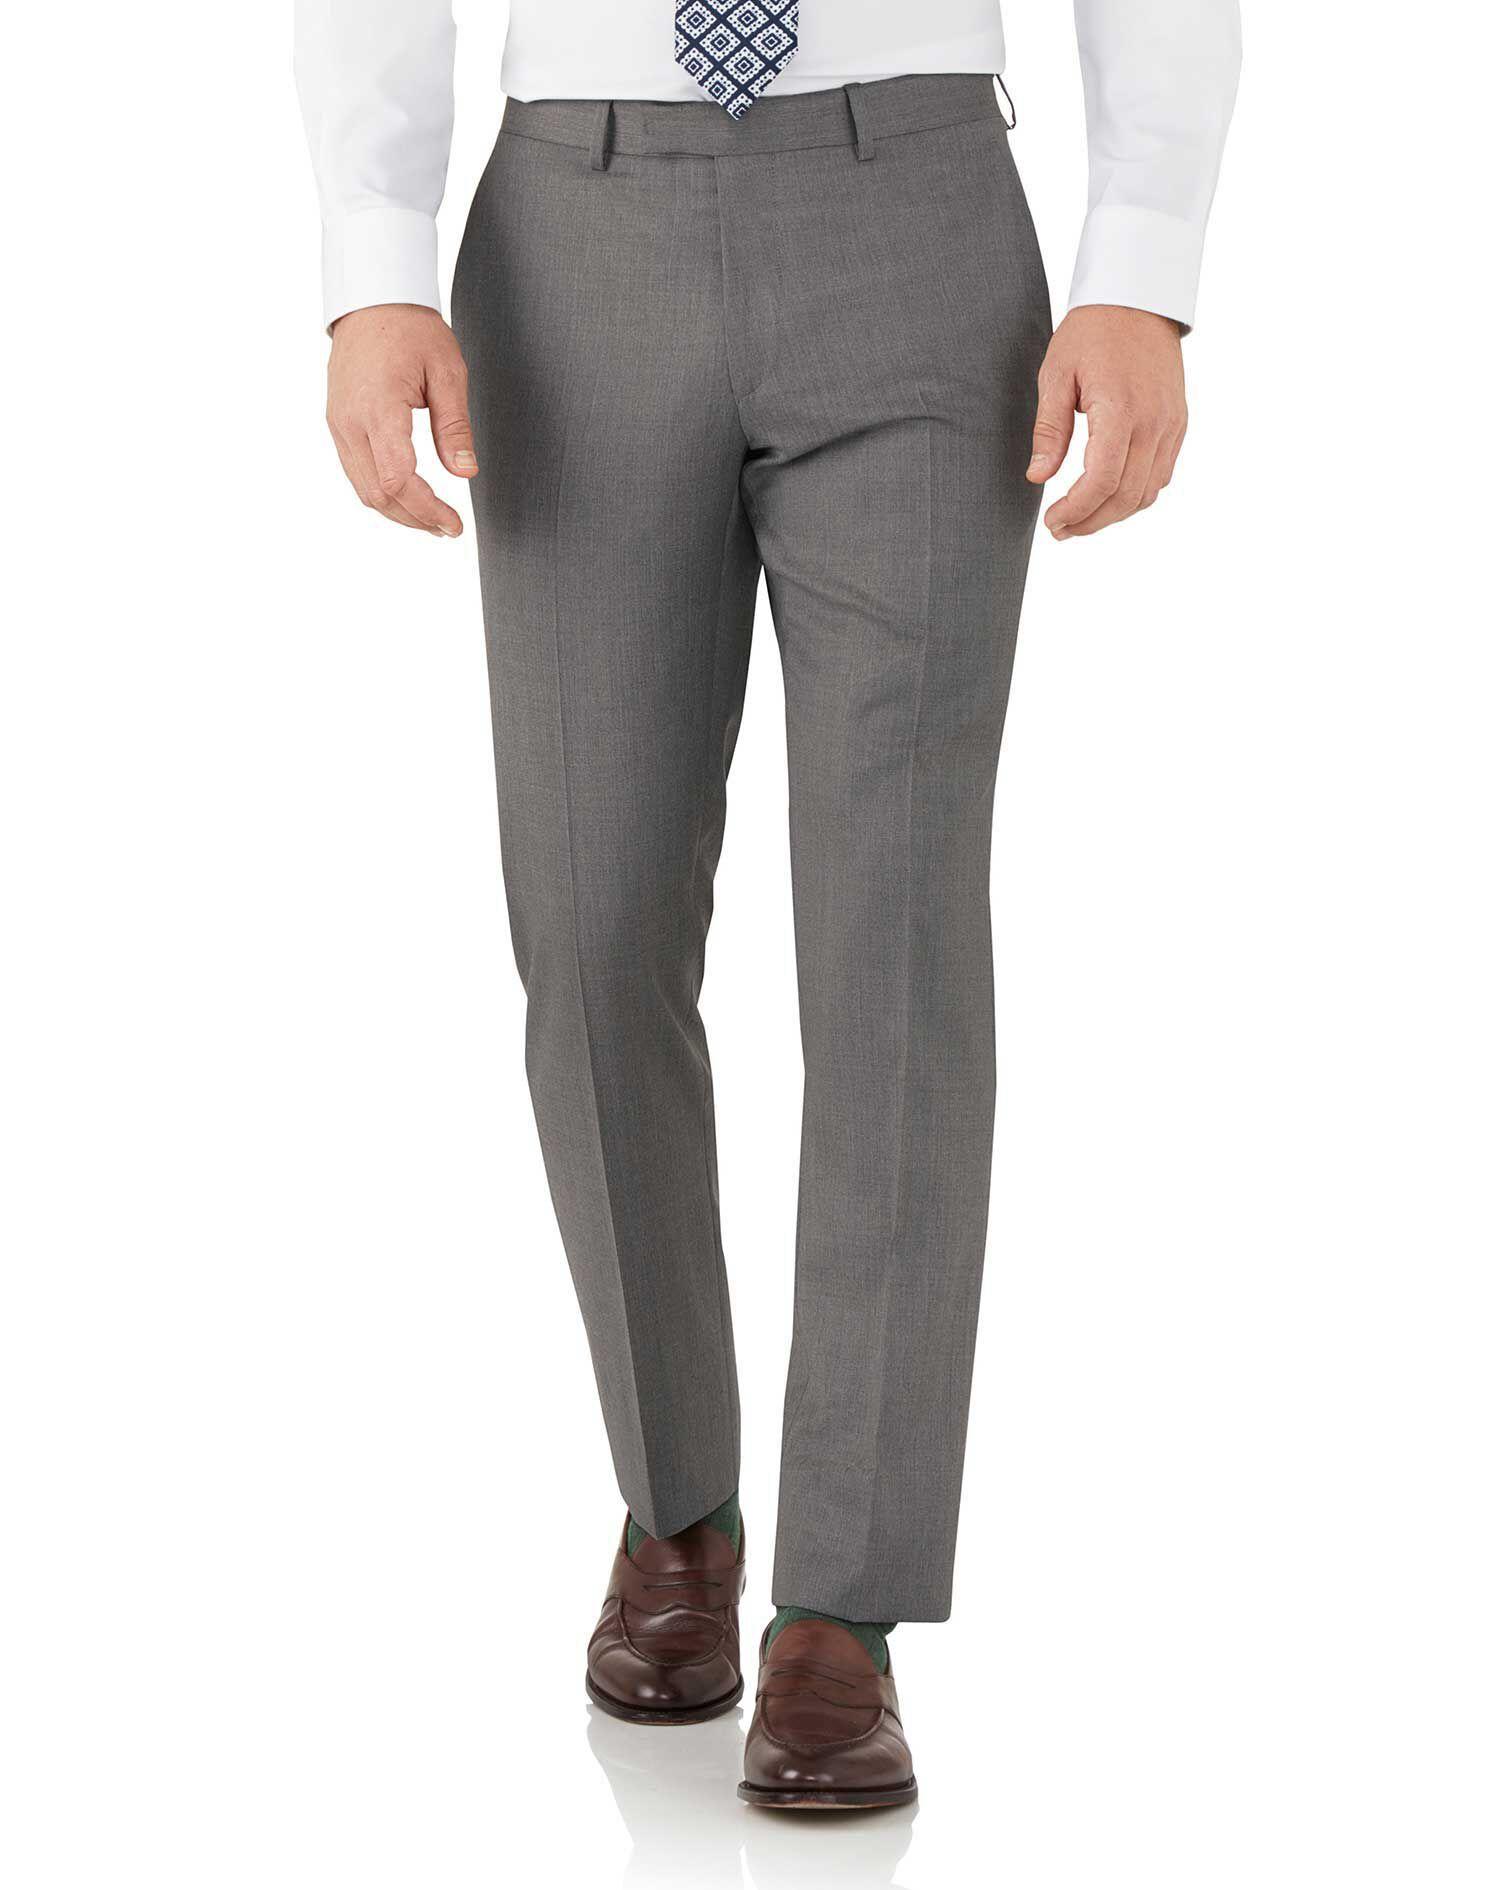 Grey Slim Fit Italian Suit Trousers Size W40 L32 by Charles Tyrwhitt